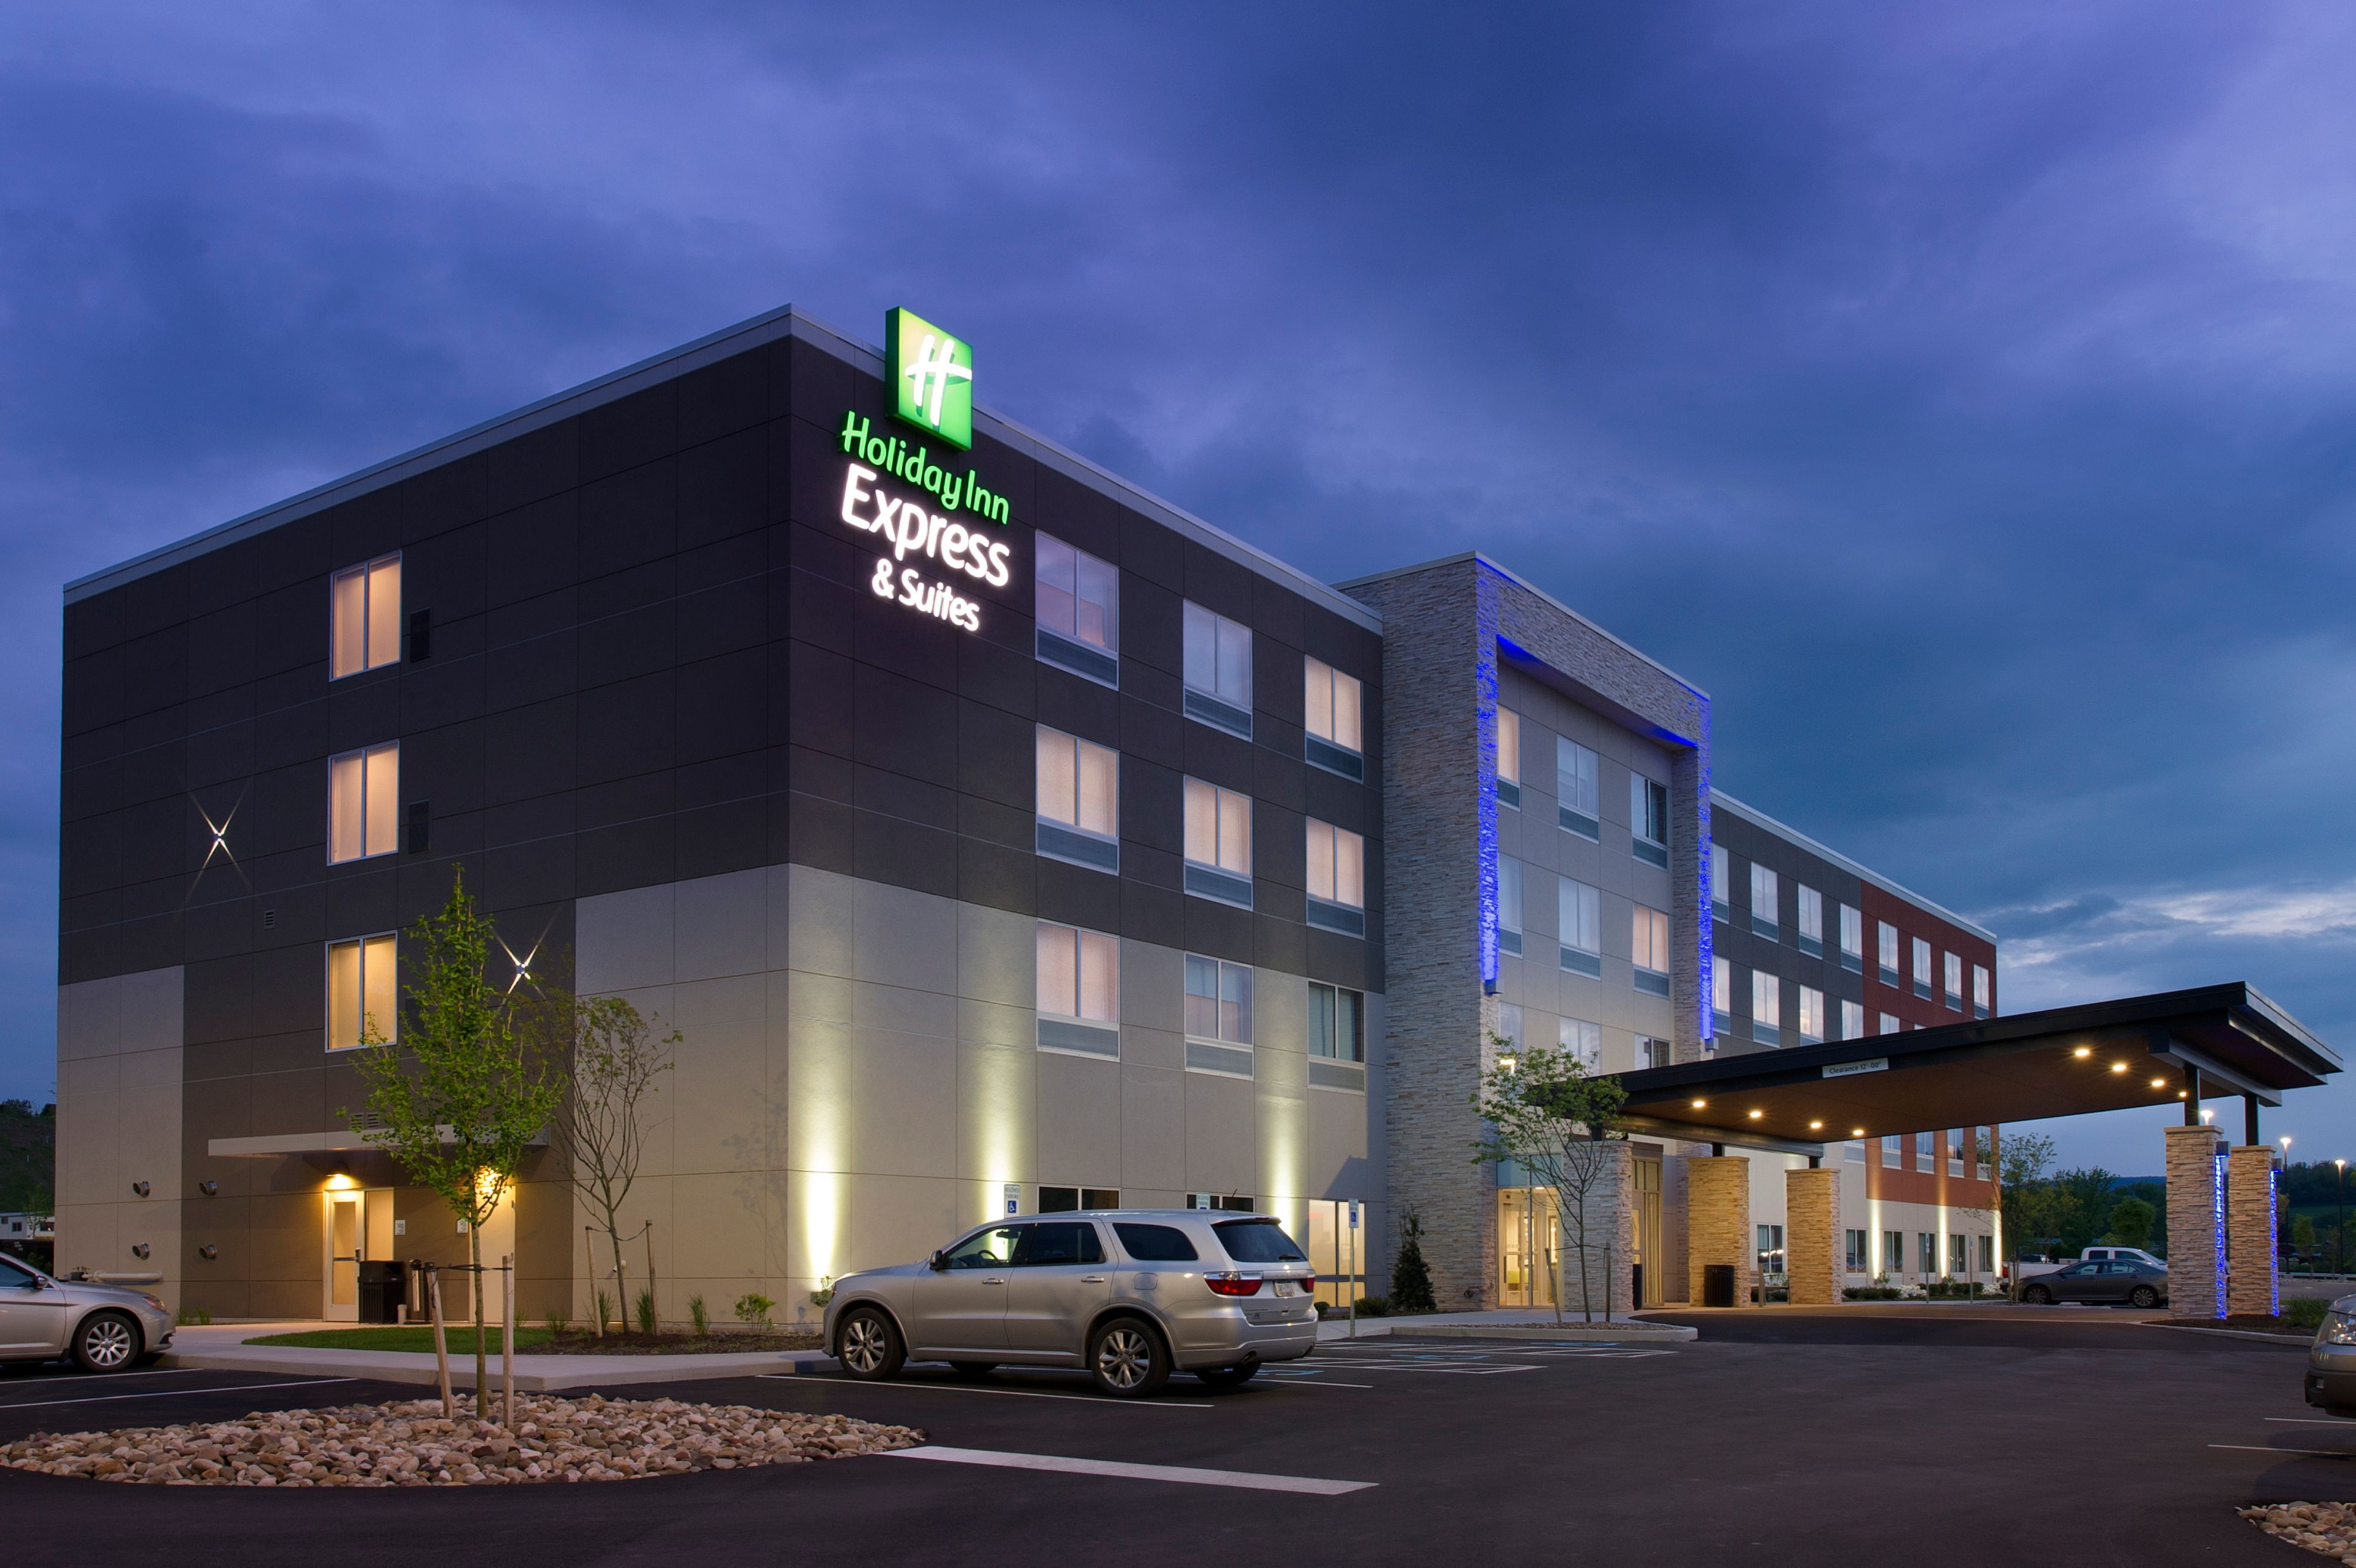 Holiday Inn Express & Suites Alpharetta - Windward Parkway image 2